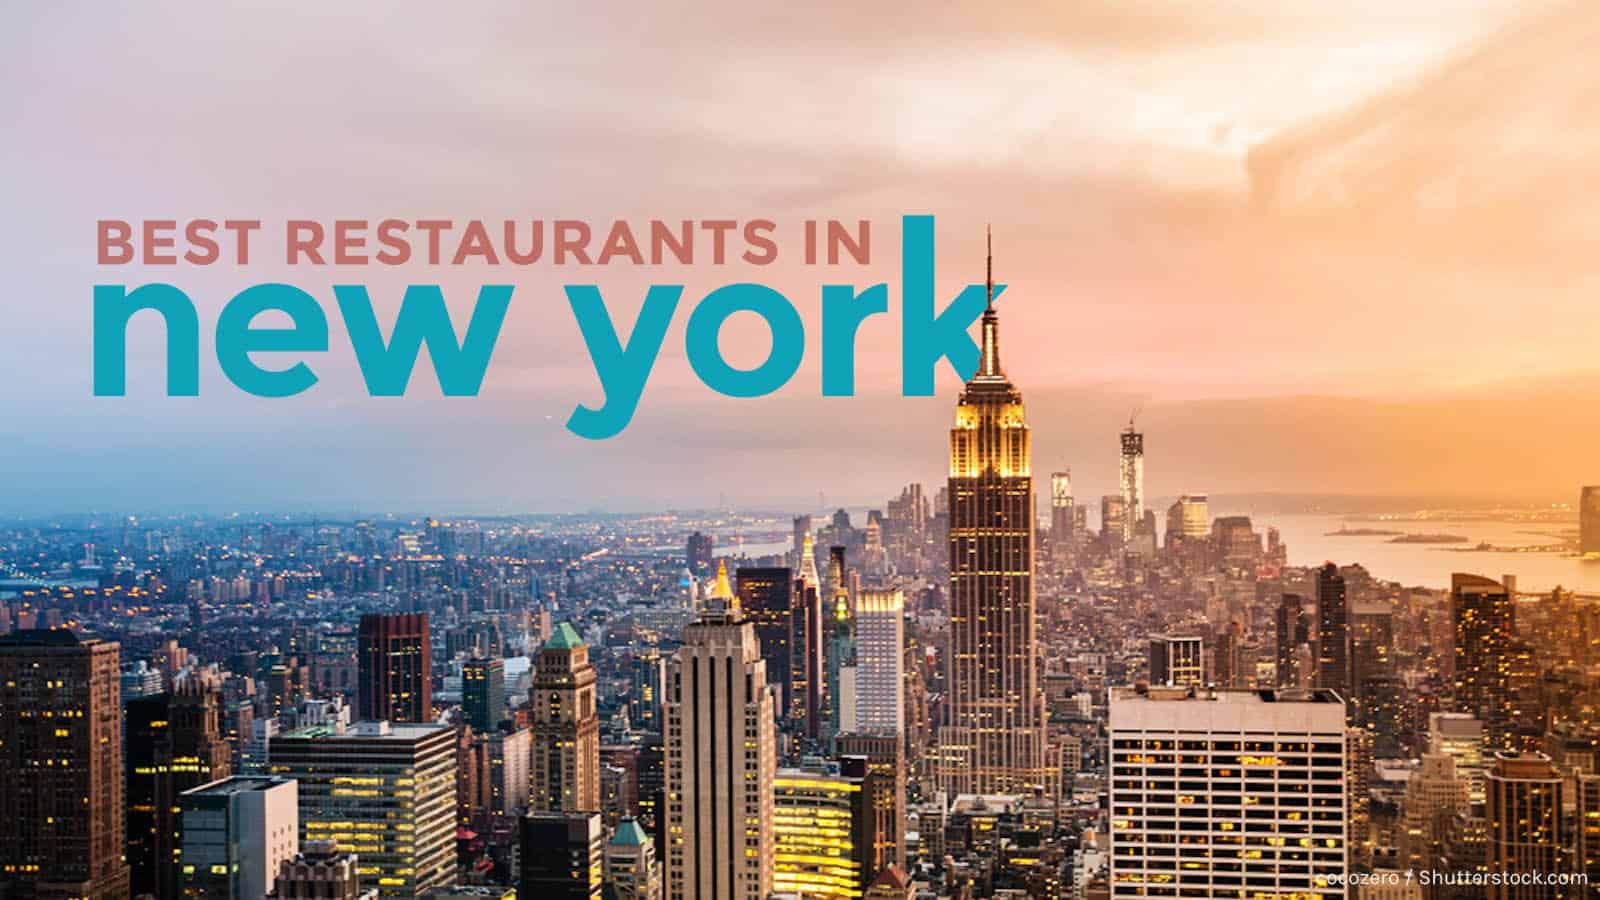 Justfly Reviews Top 10 Best Restaurants In New York City